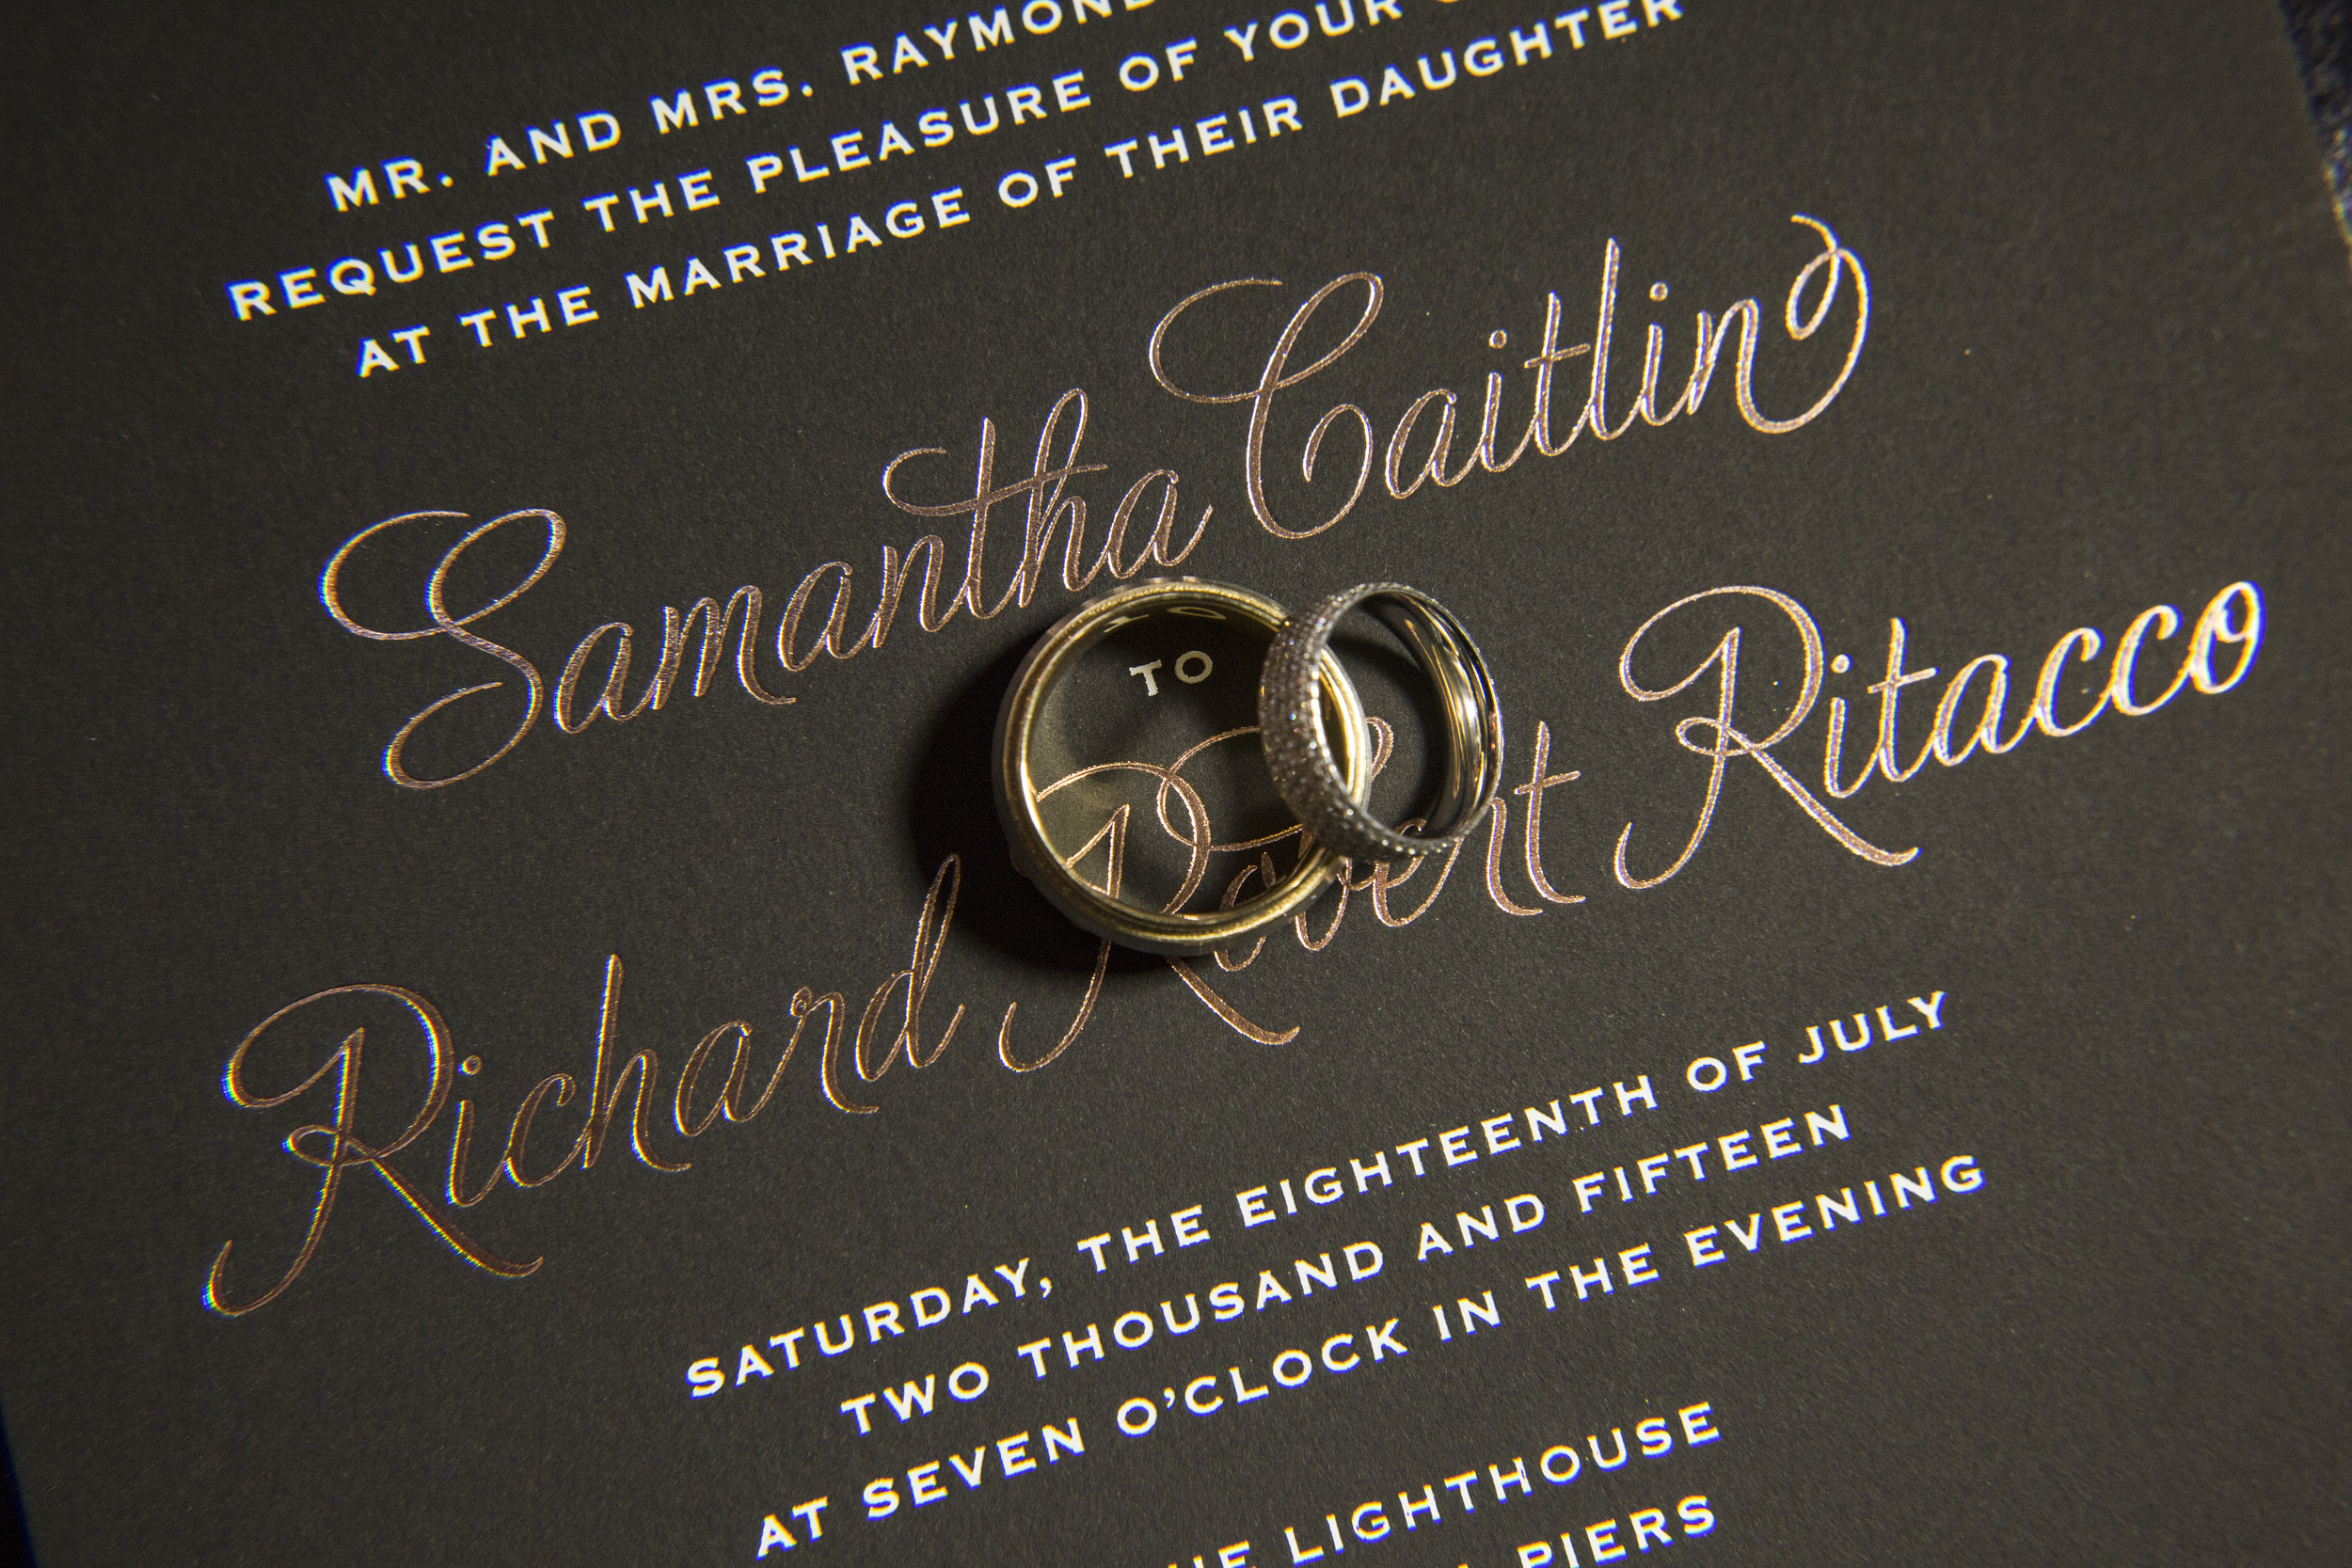 Ceci_New_York_Style_Luxury_Custom_Summer_Wedding_CeciBride_Letterpress_NewYork_Foil_Lighthouse_Chelsea_Piers_93.jpg